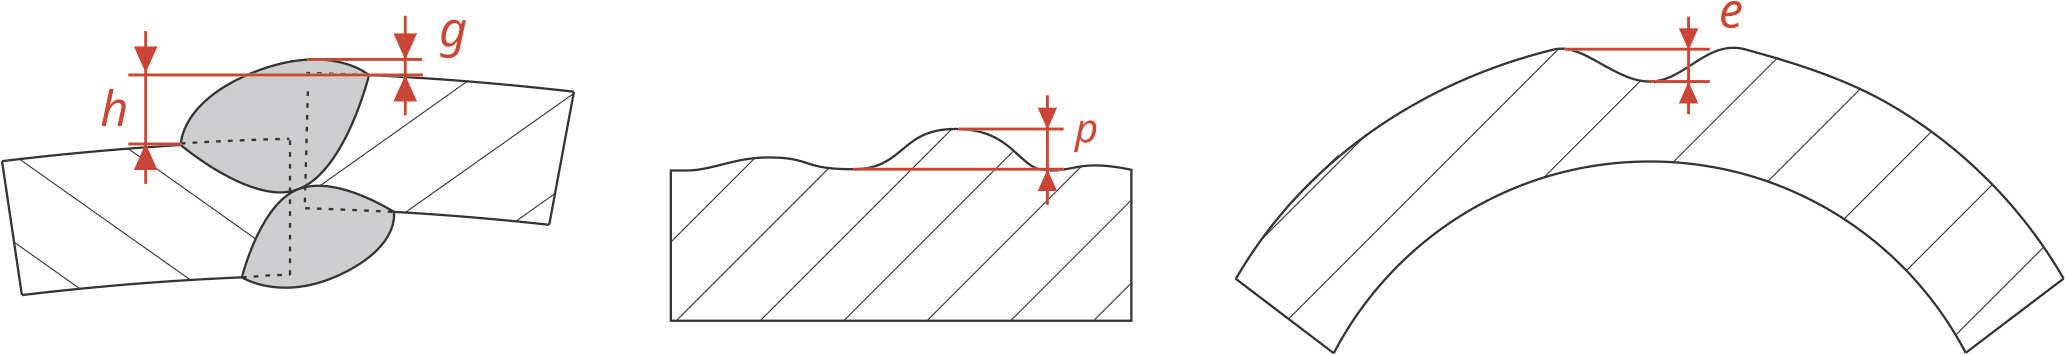 wg 11 parametry